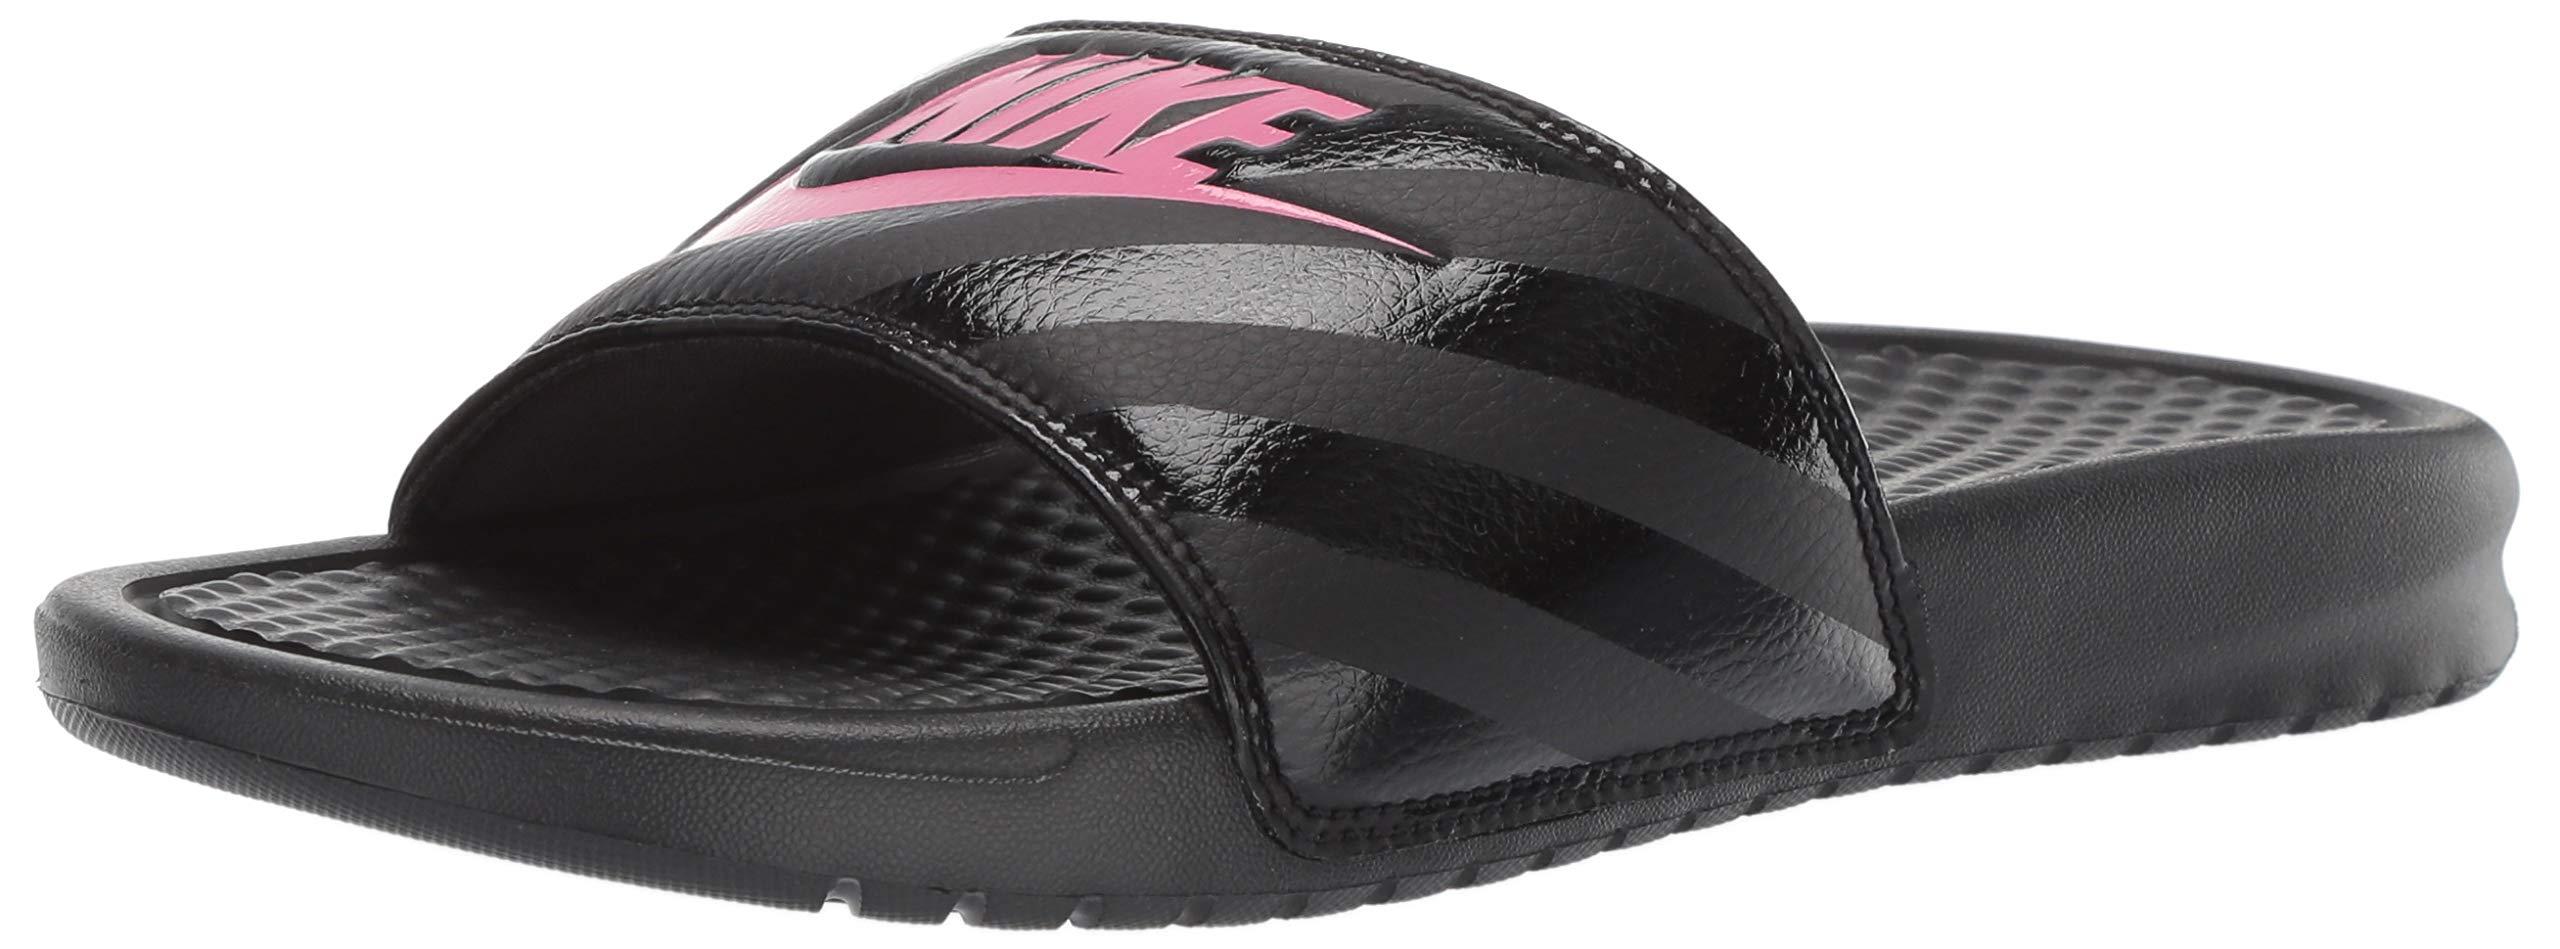 c455cb50c3588 Galleon - Nike Women s Benassi Just Do It Sandal Vivid Pink-Black